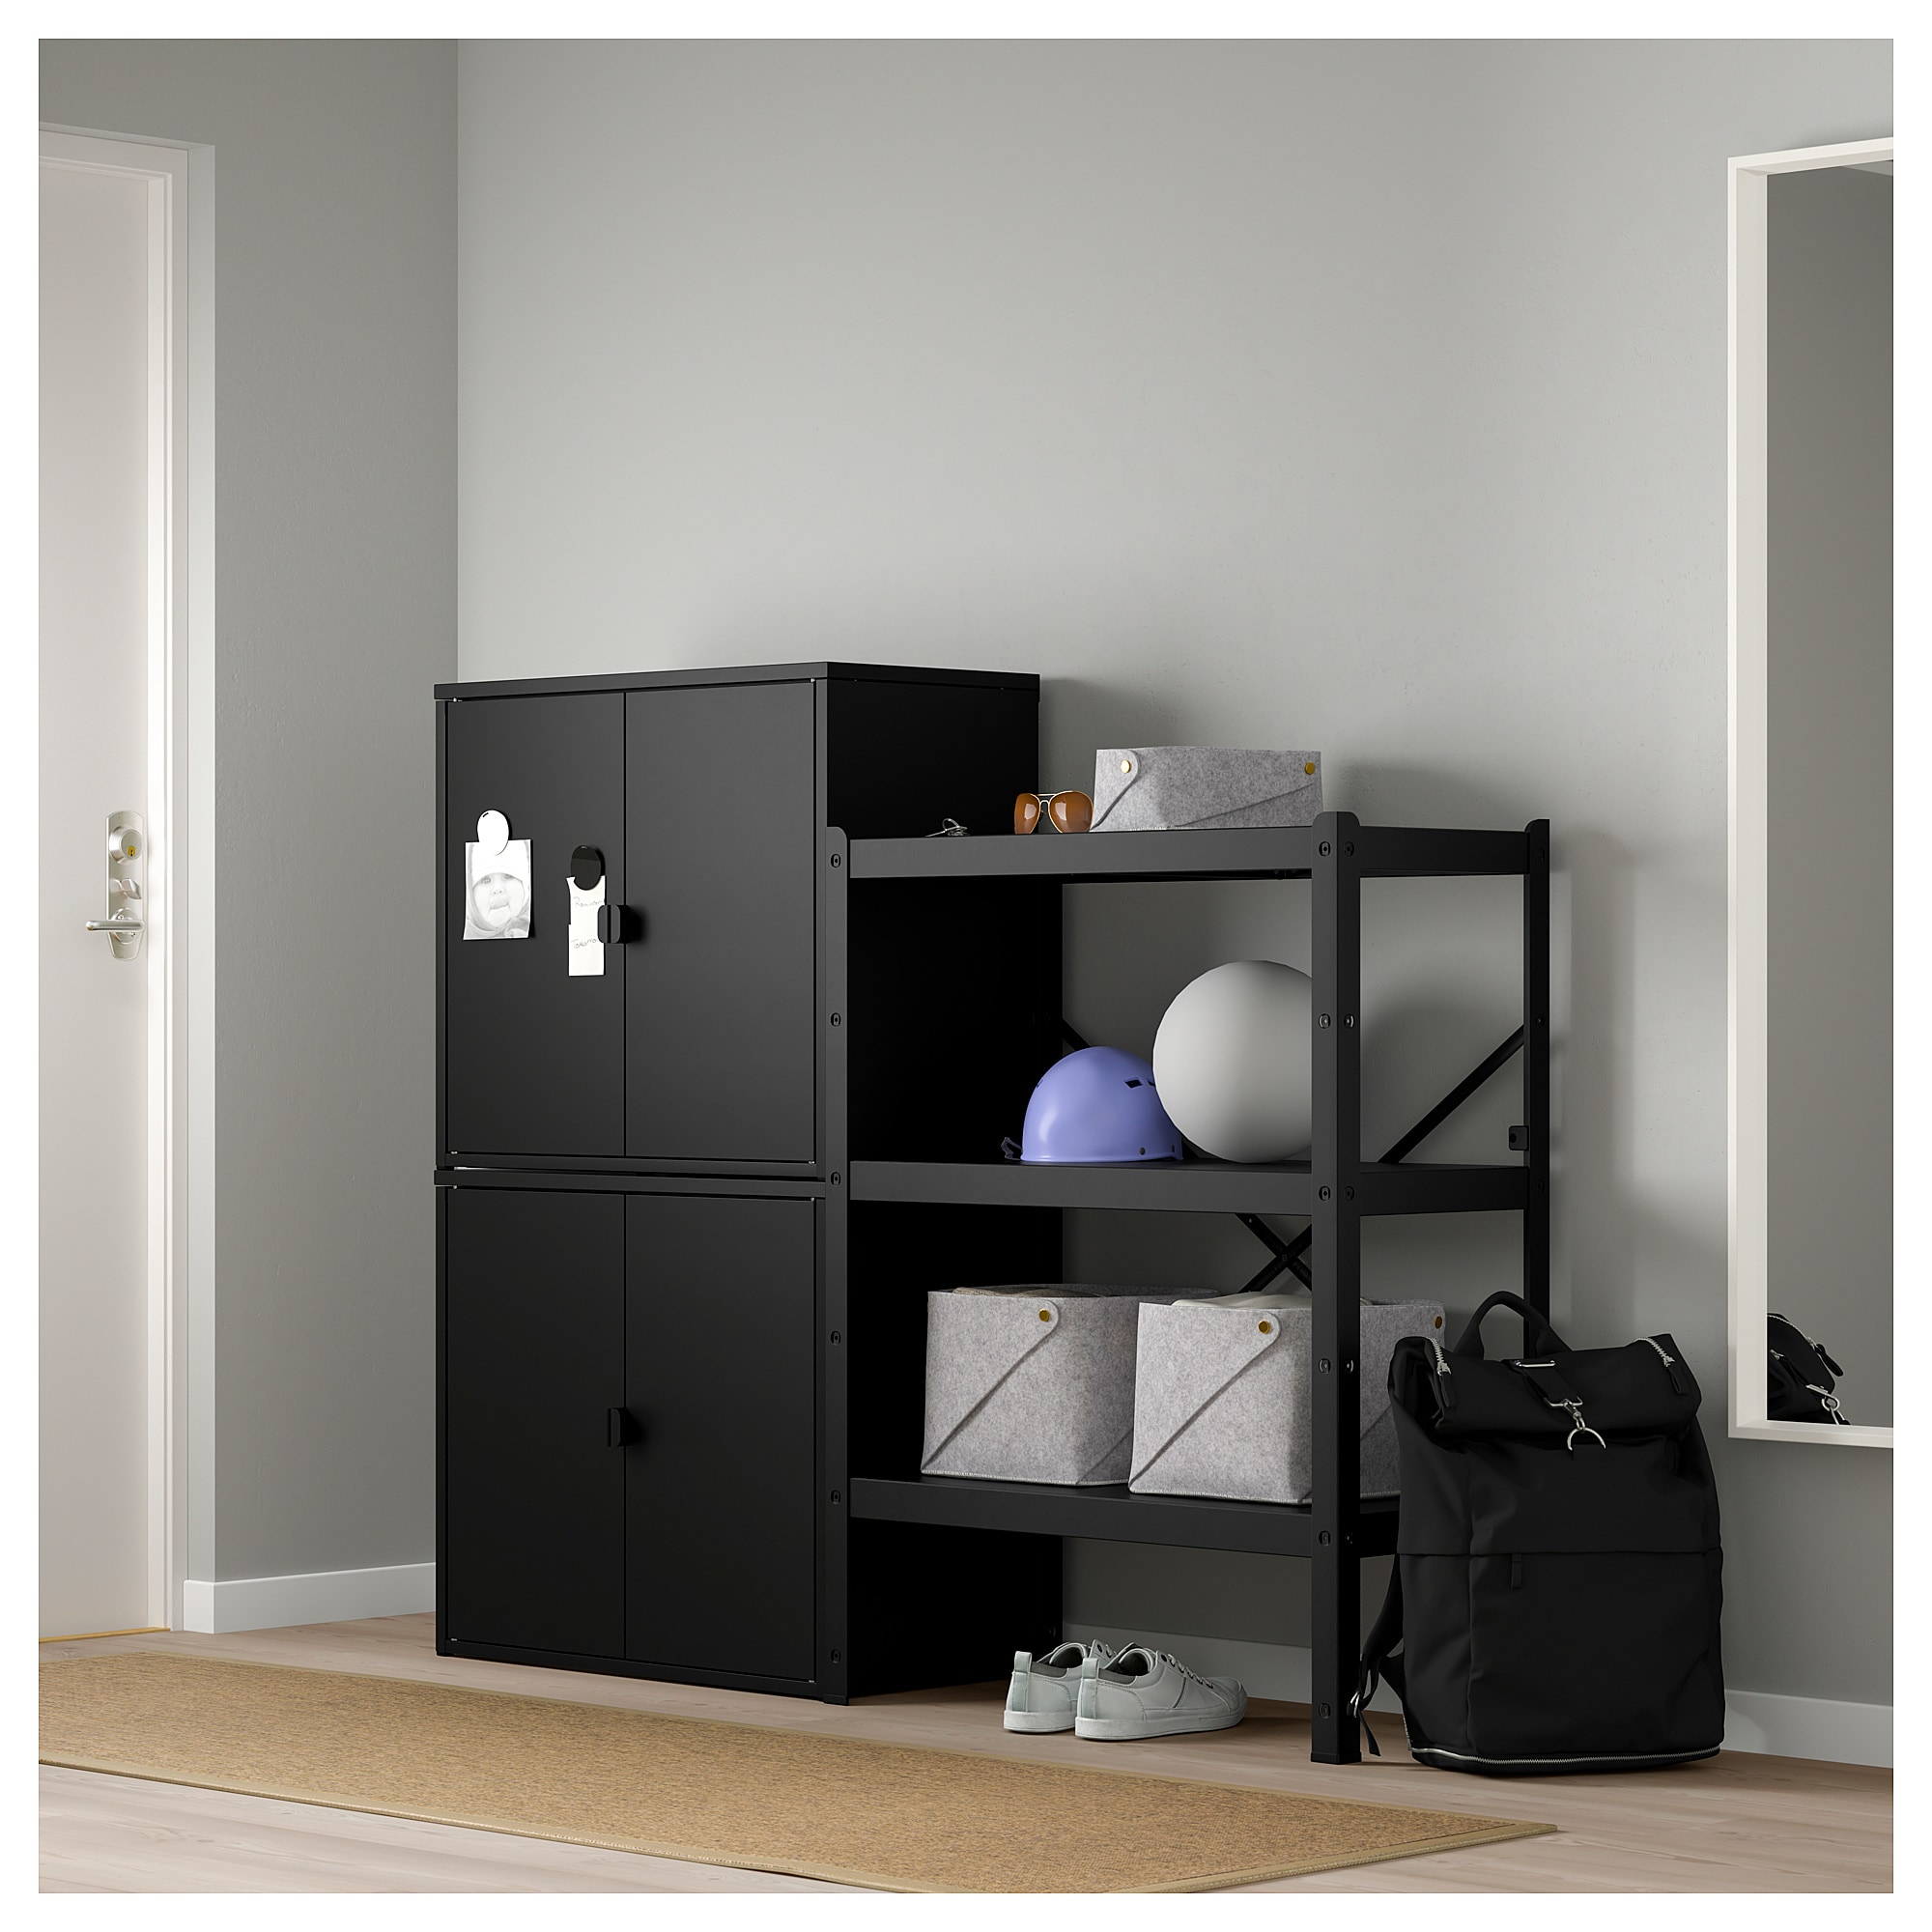 Bror Shelving Unit With Cabinets Ikea Shelving Unit Shelving Living Room Shelves